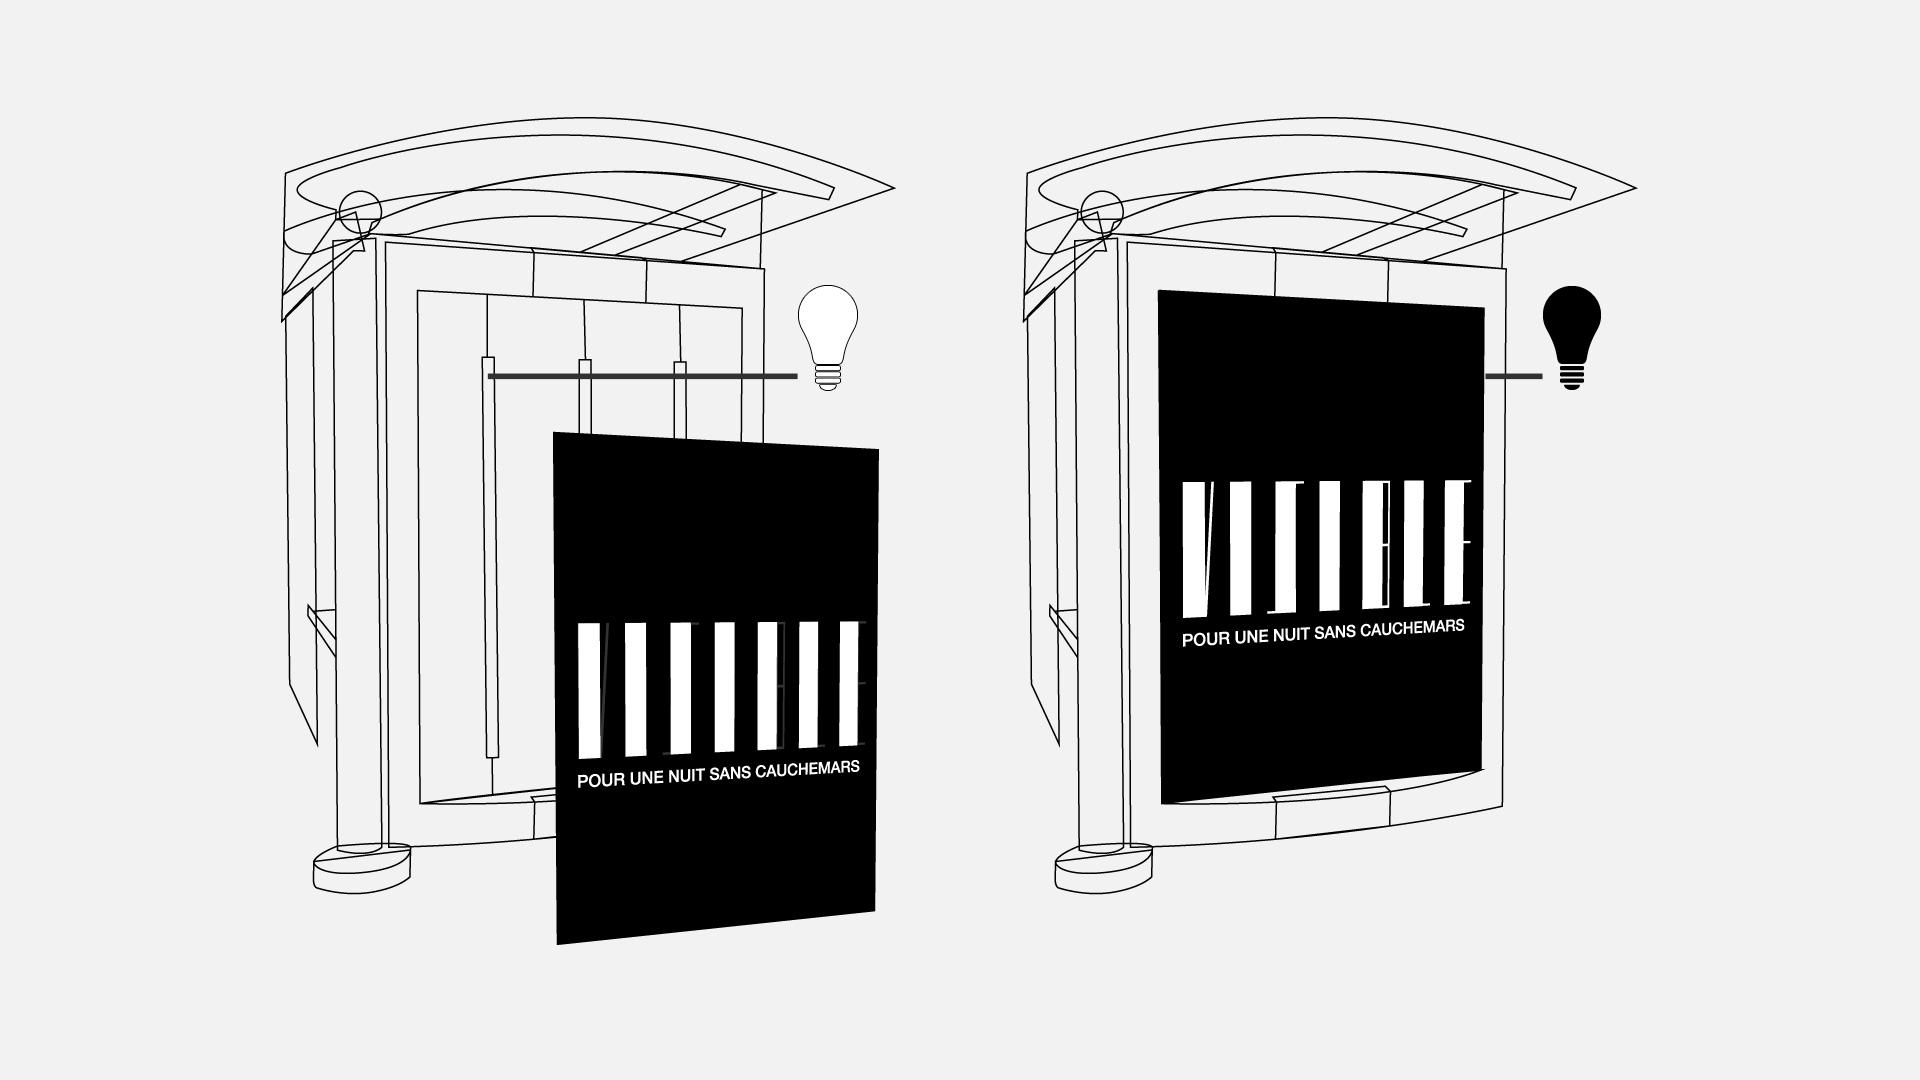 08_florian_branchet_designer_graphique_visible_schema